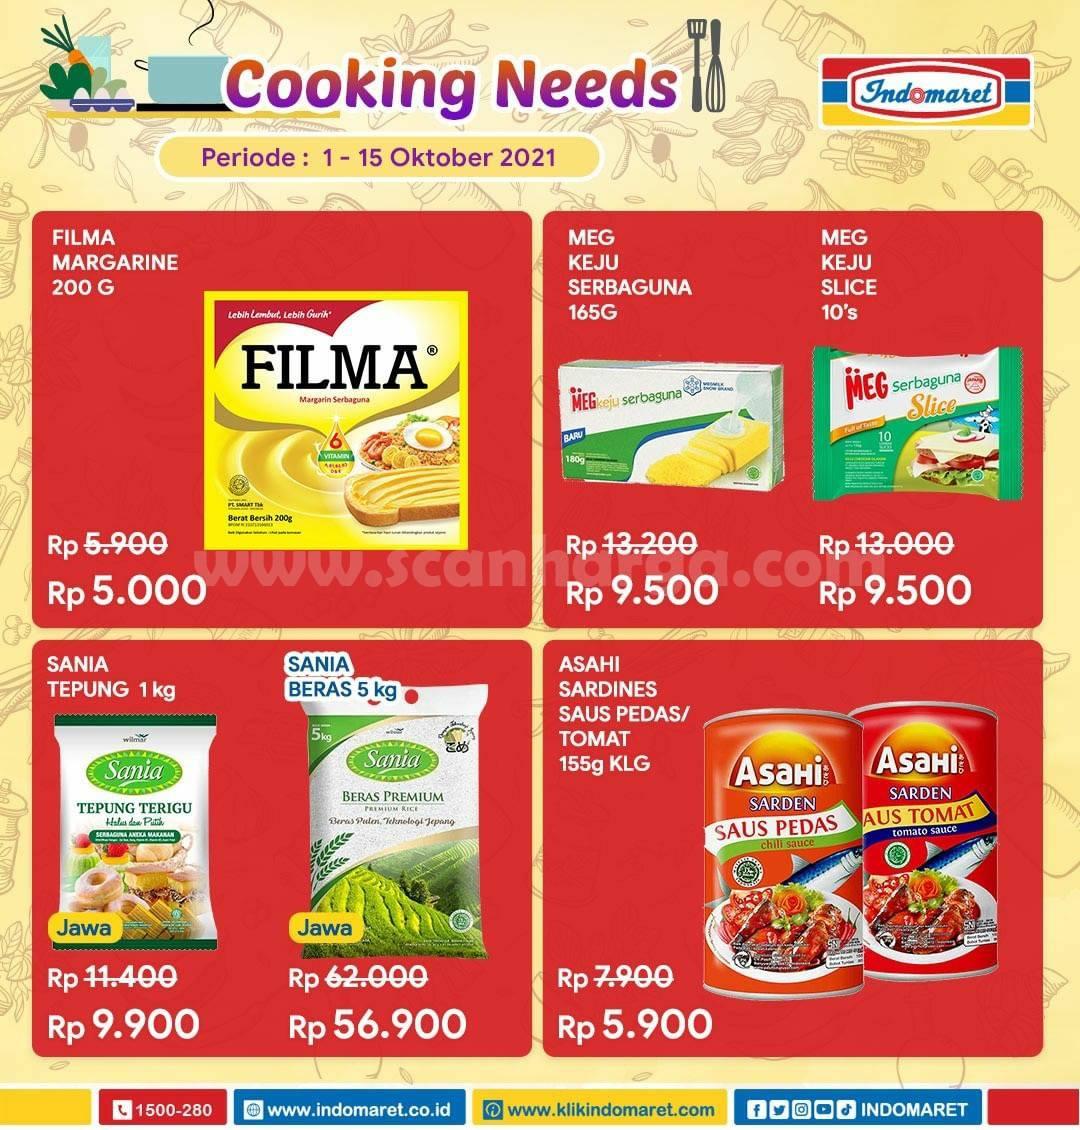 Promo Indomaret Cooking Needs hingga 15 Oktober 2021 2